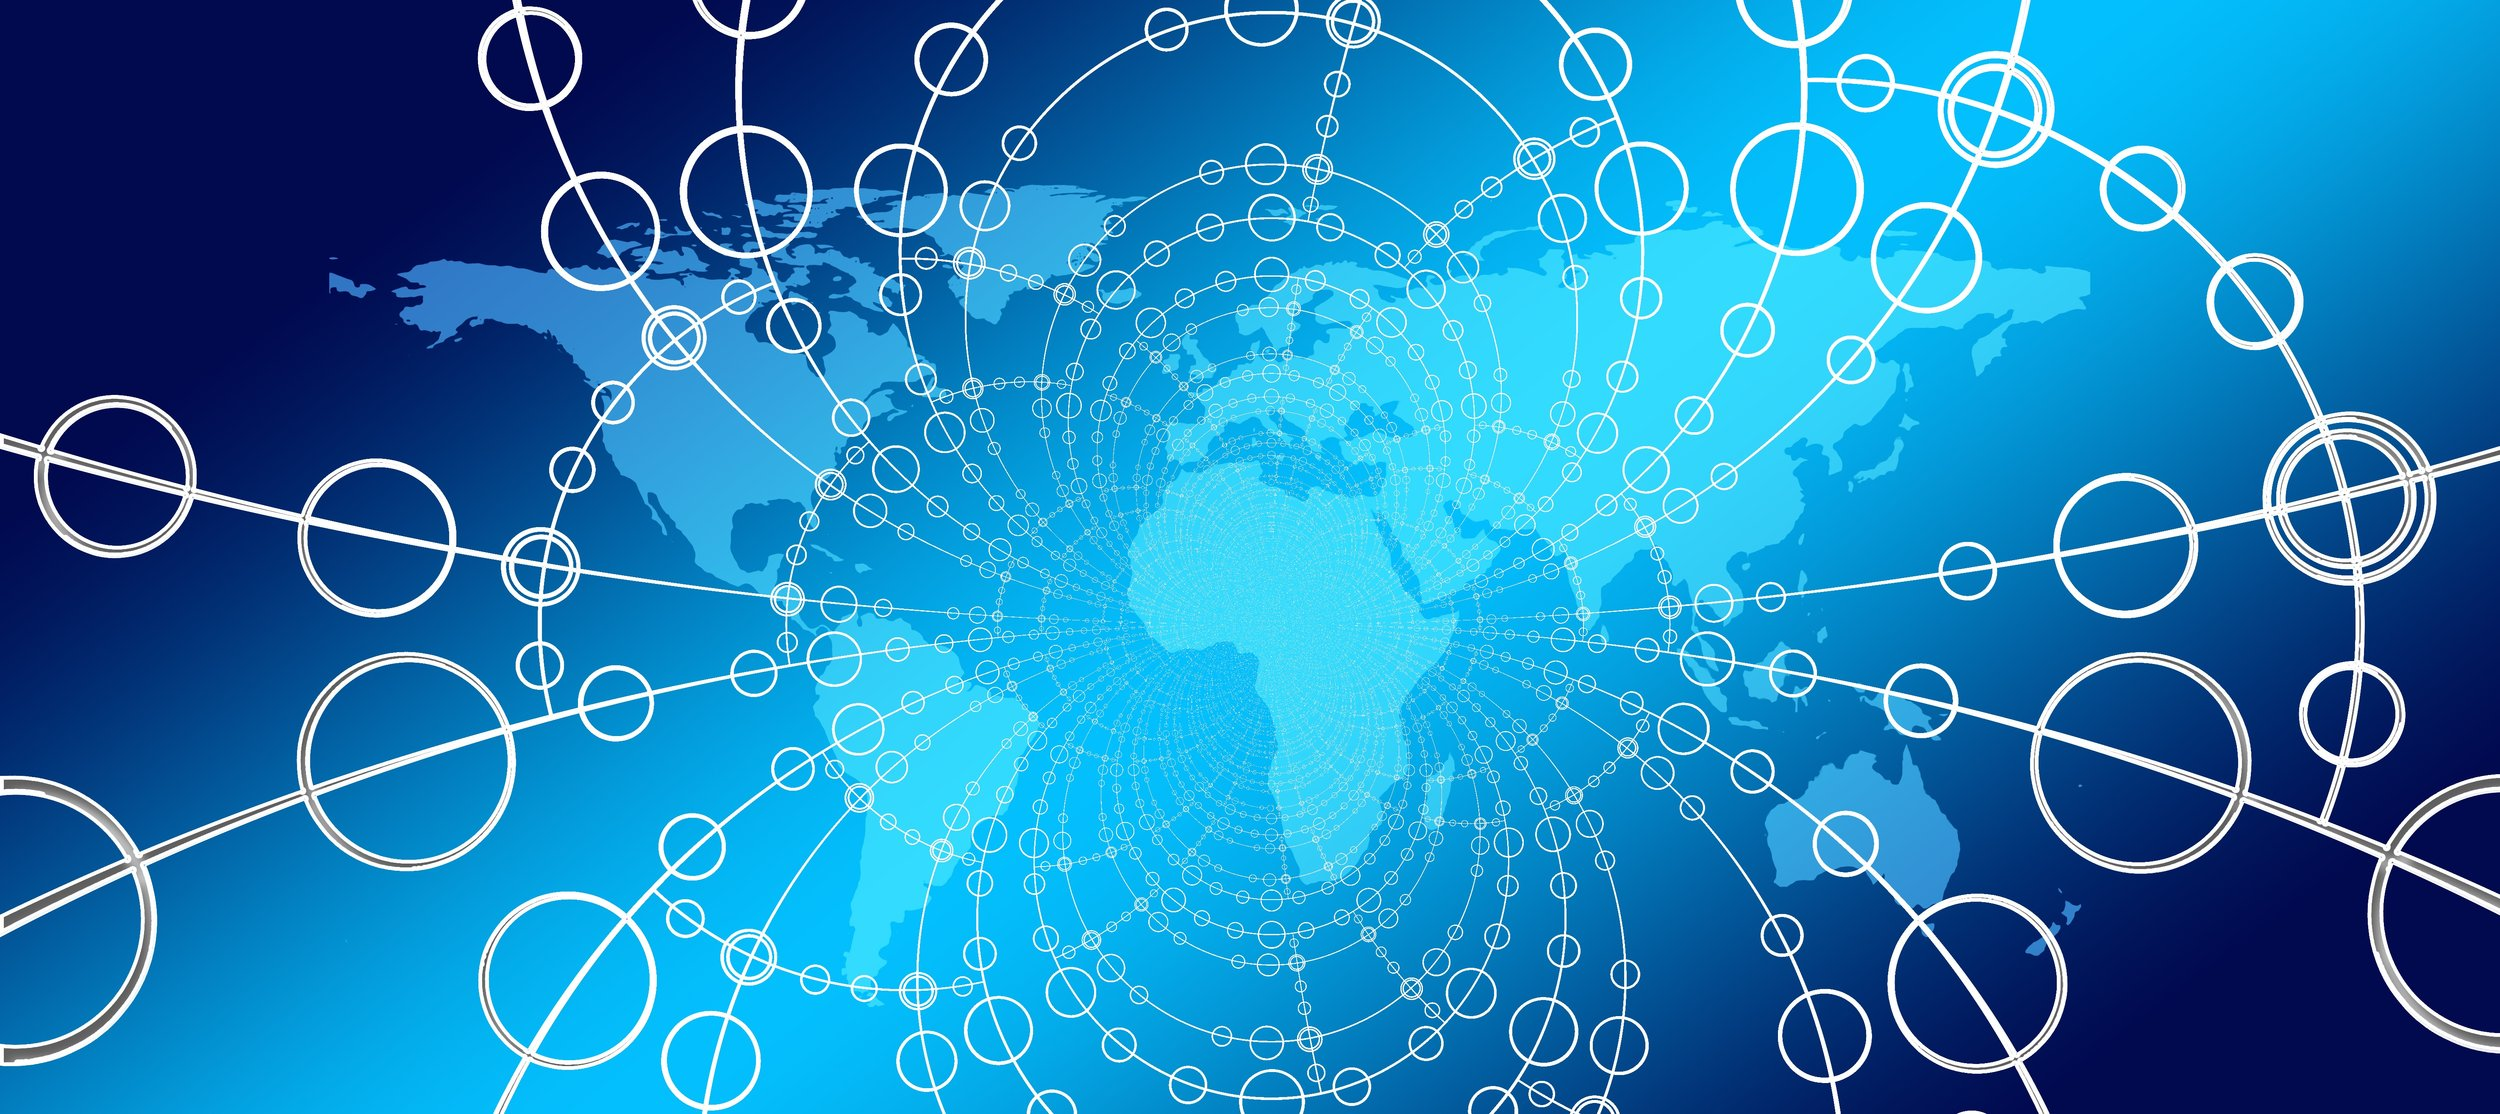 network-1433045.jpg